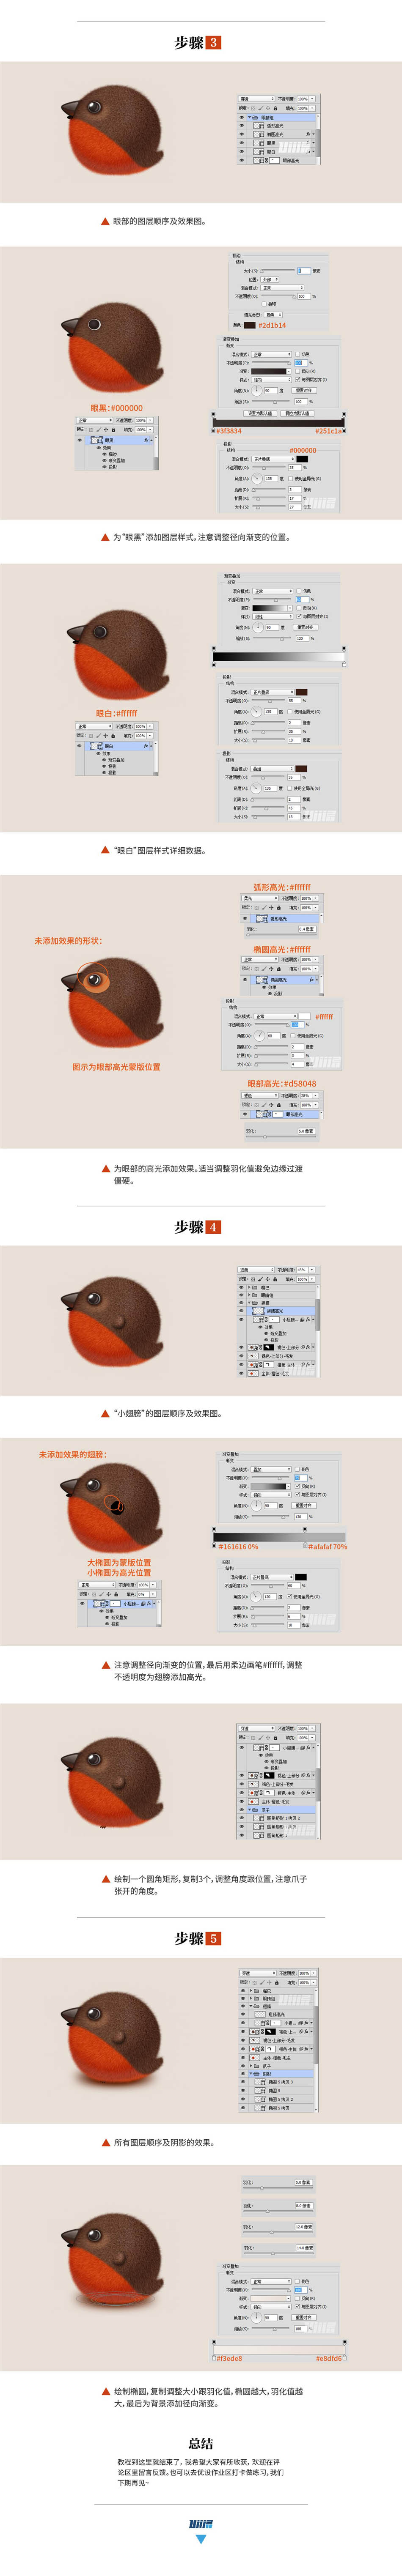 Photoshop繪製毛茸茸的可愛小鳥